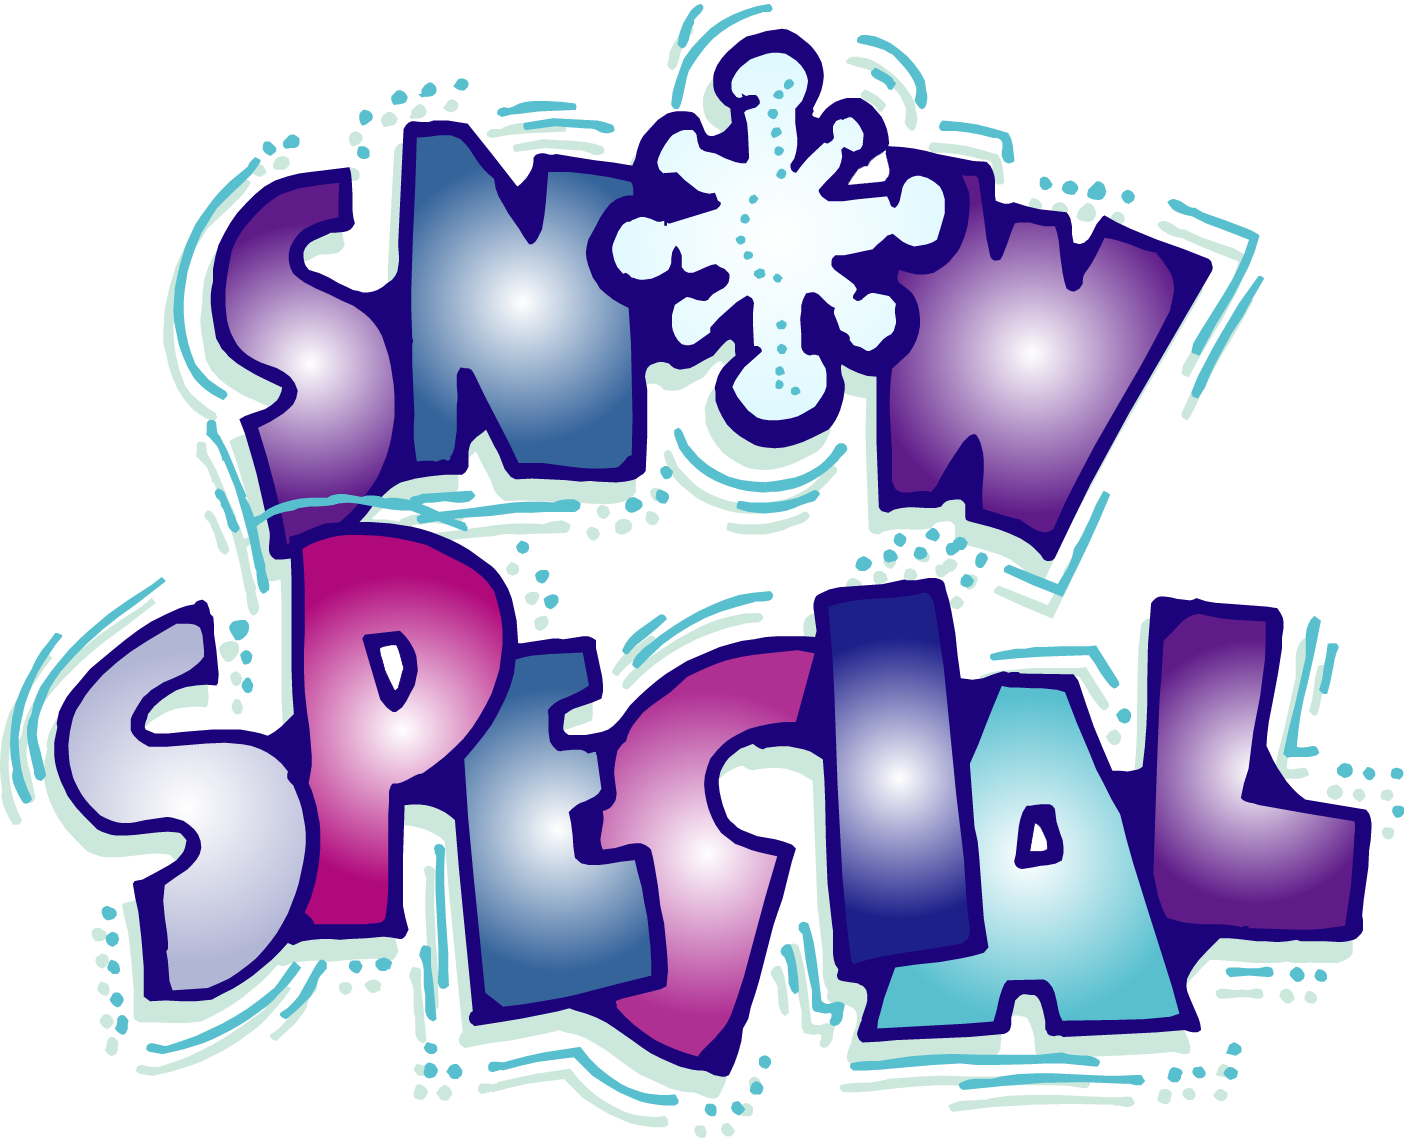 KinderKids Fun: It's A Winter Wonderland